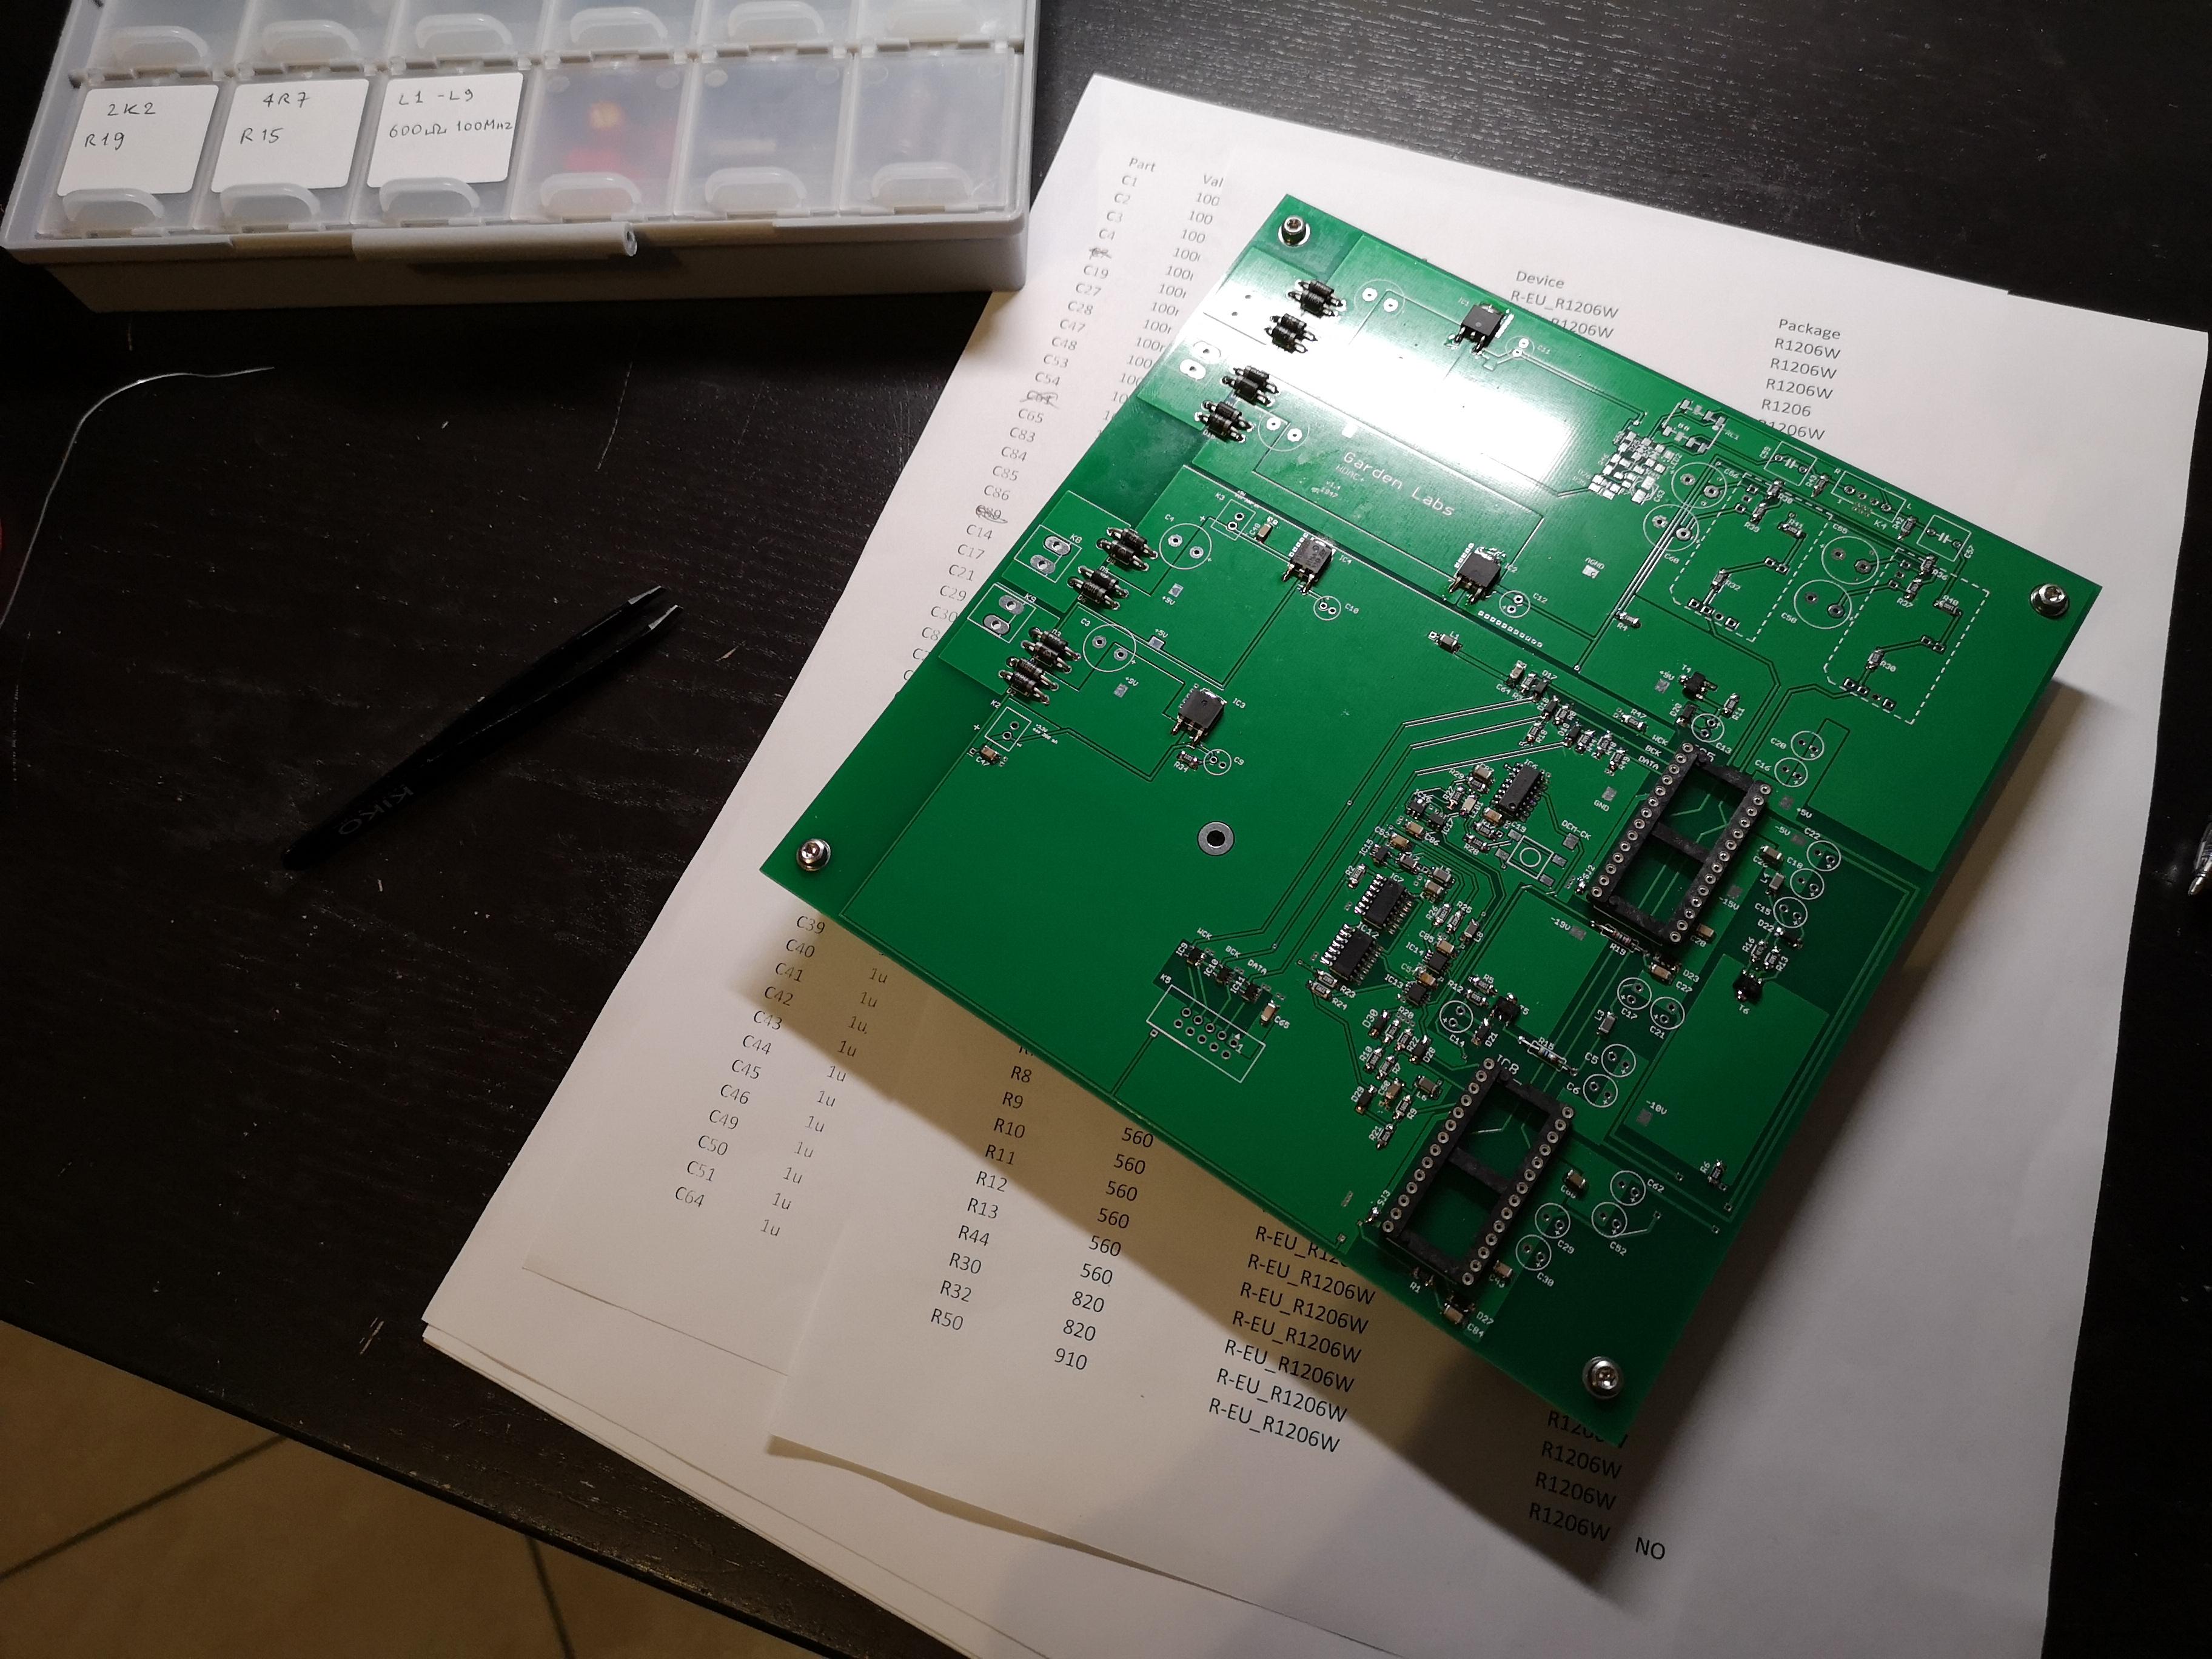 HDAC+ Assembliamo la scheda principale 49152415383_71fe79a3fc_o_d